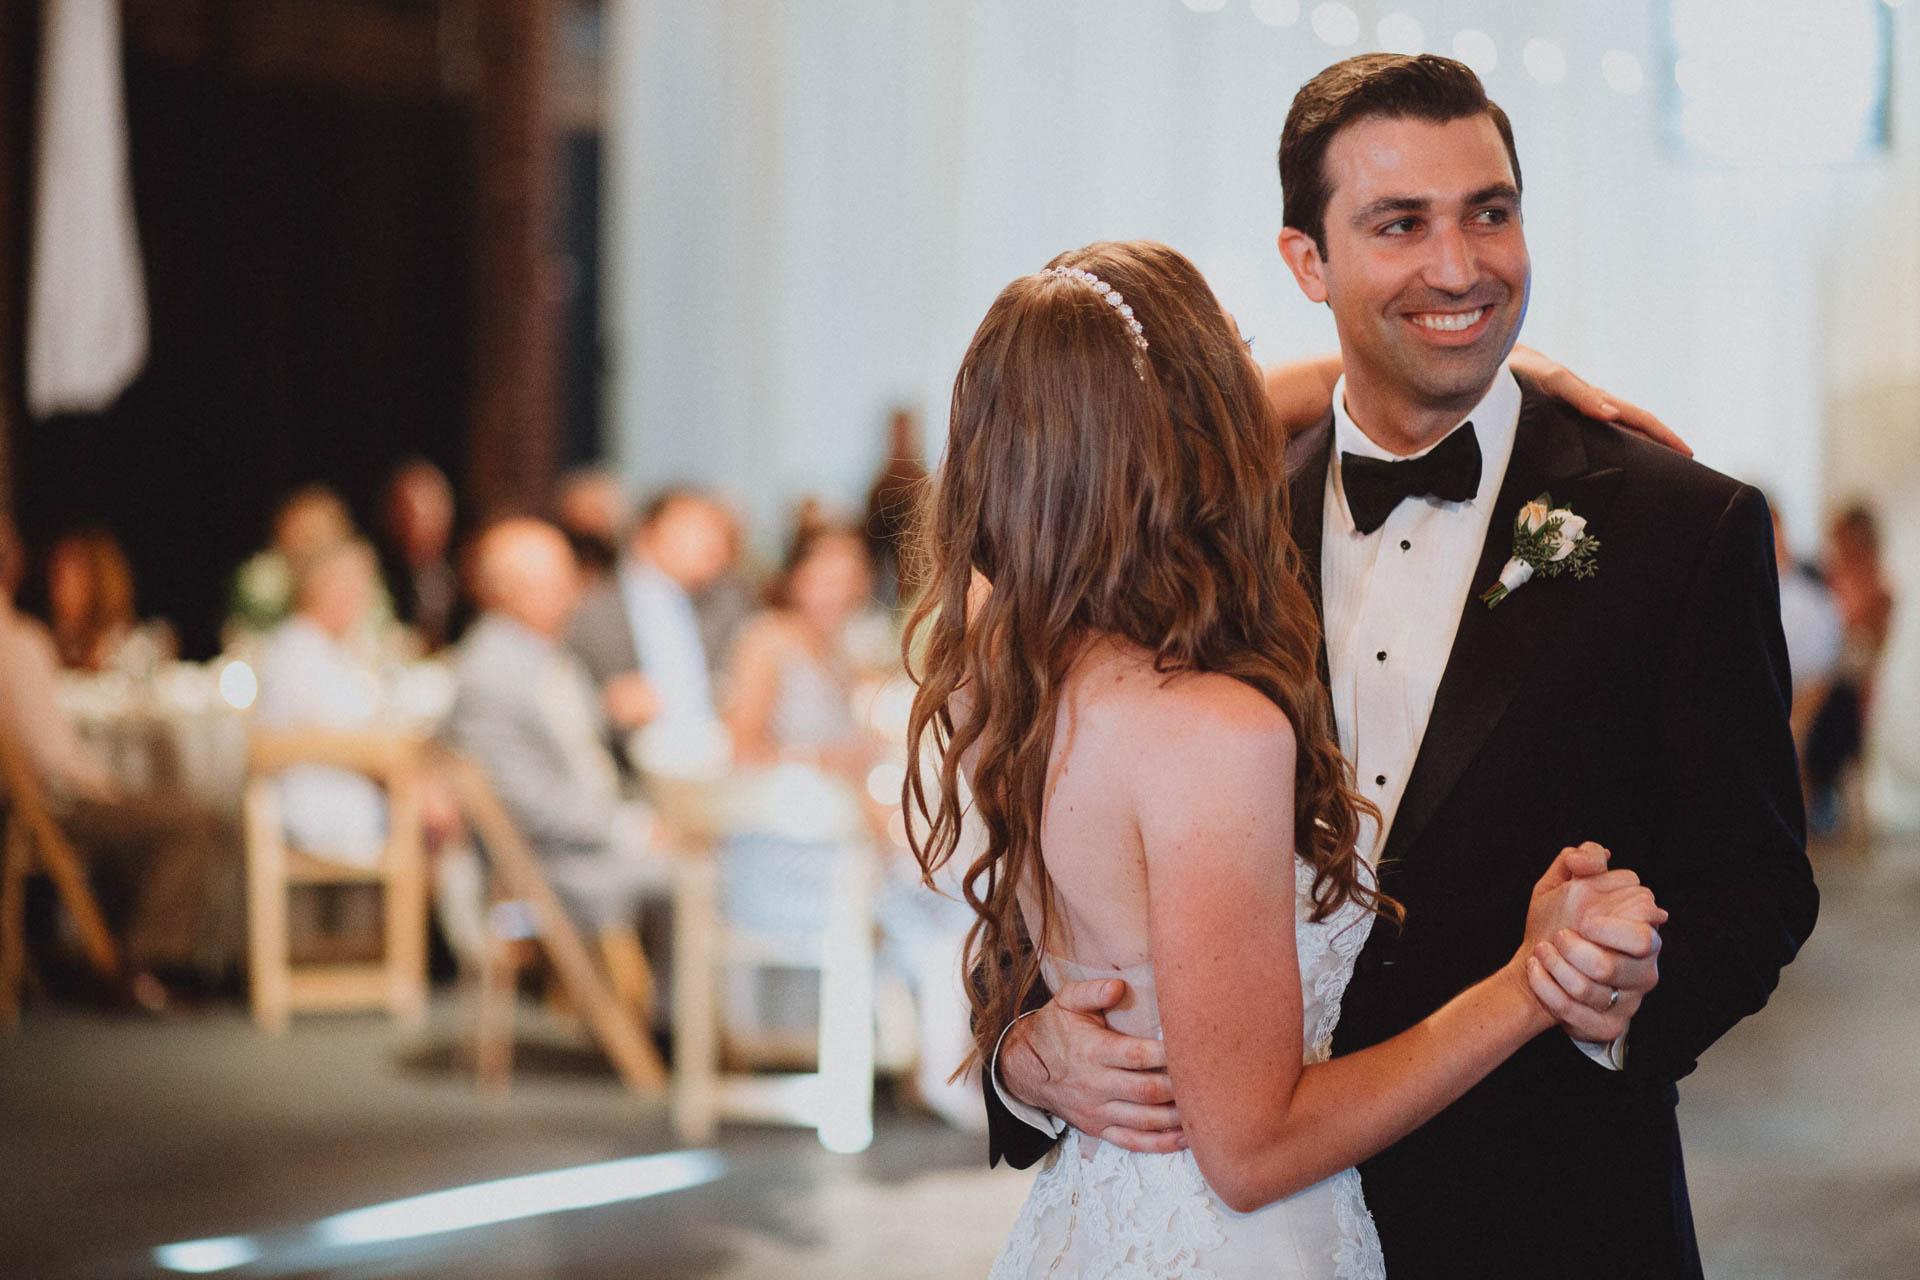 Keri-Joseph-Top-of-the-Market-Wedding-169@2x.jpg